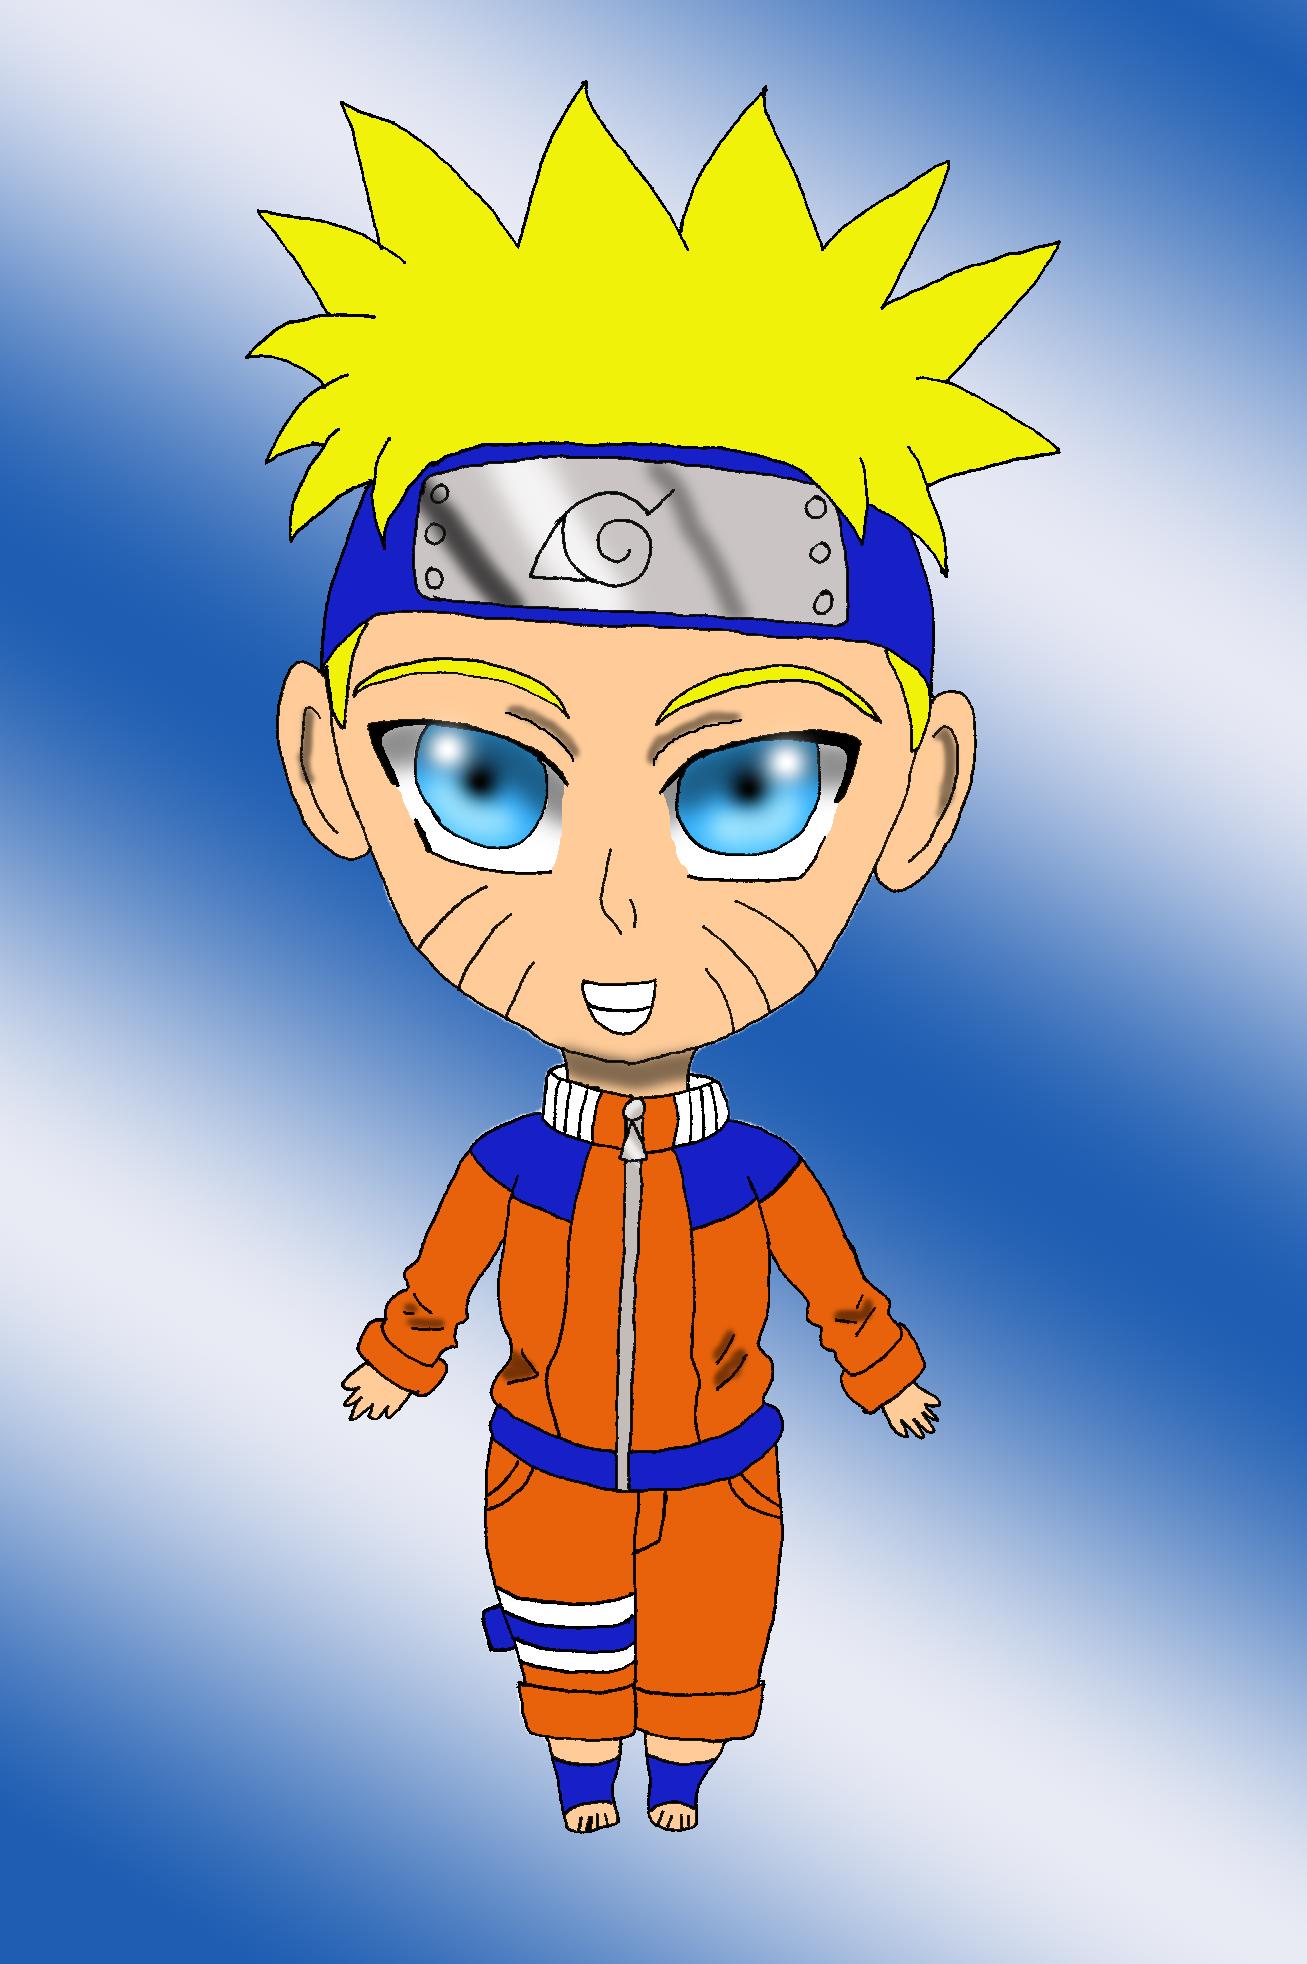 Chibi naruto anime fan art 36588555 fanpop - Naruto chibi images ...